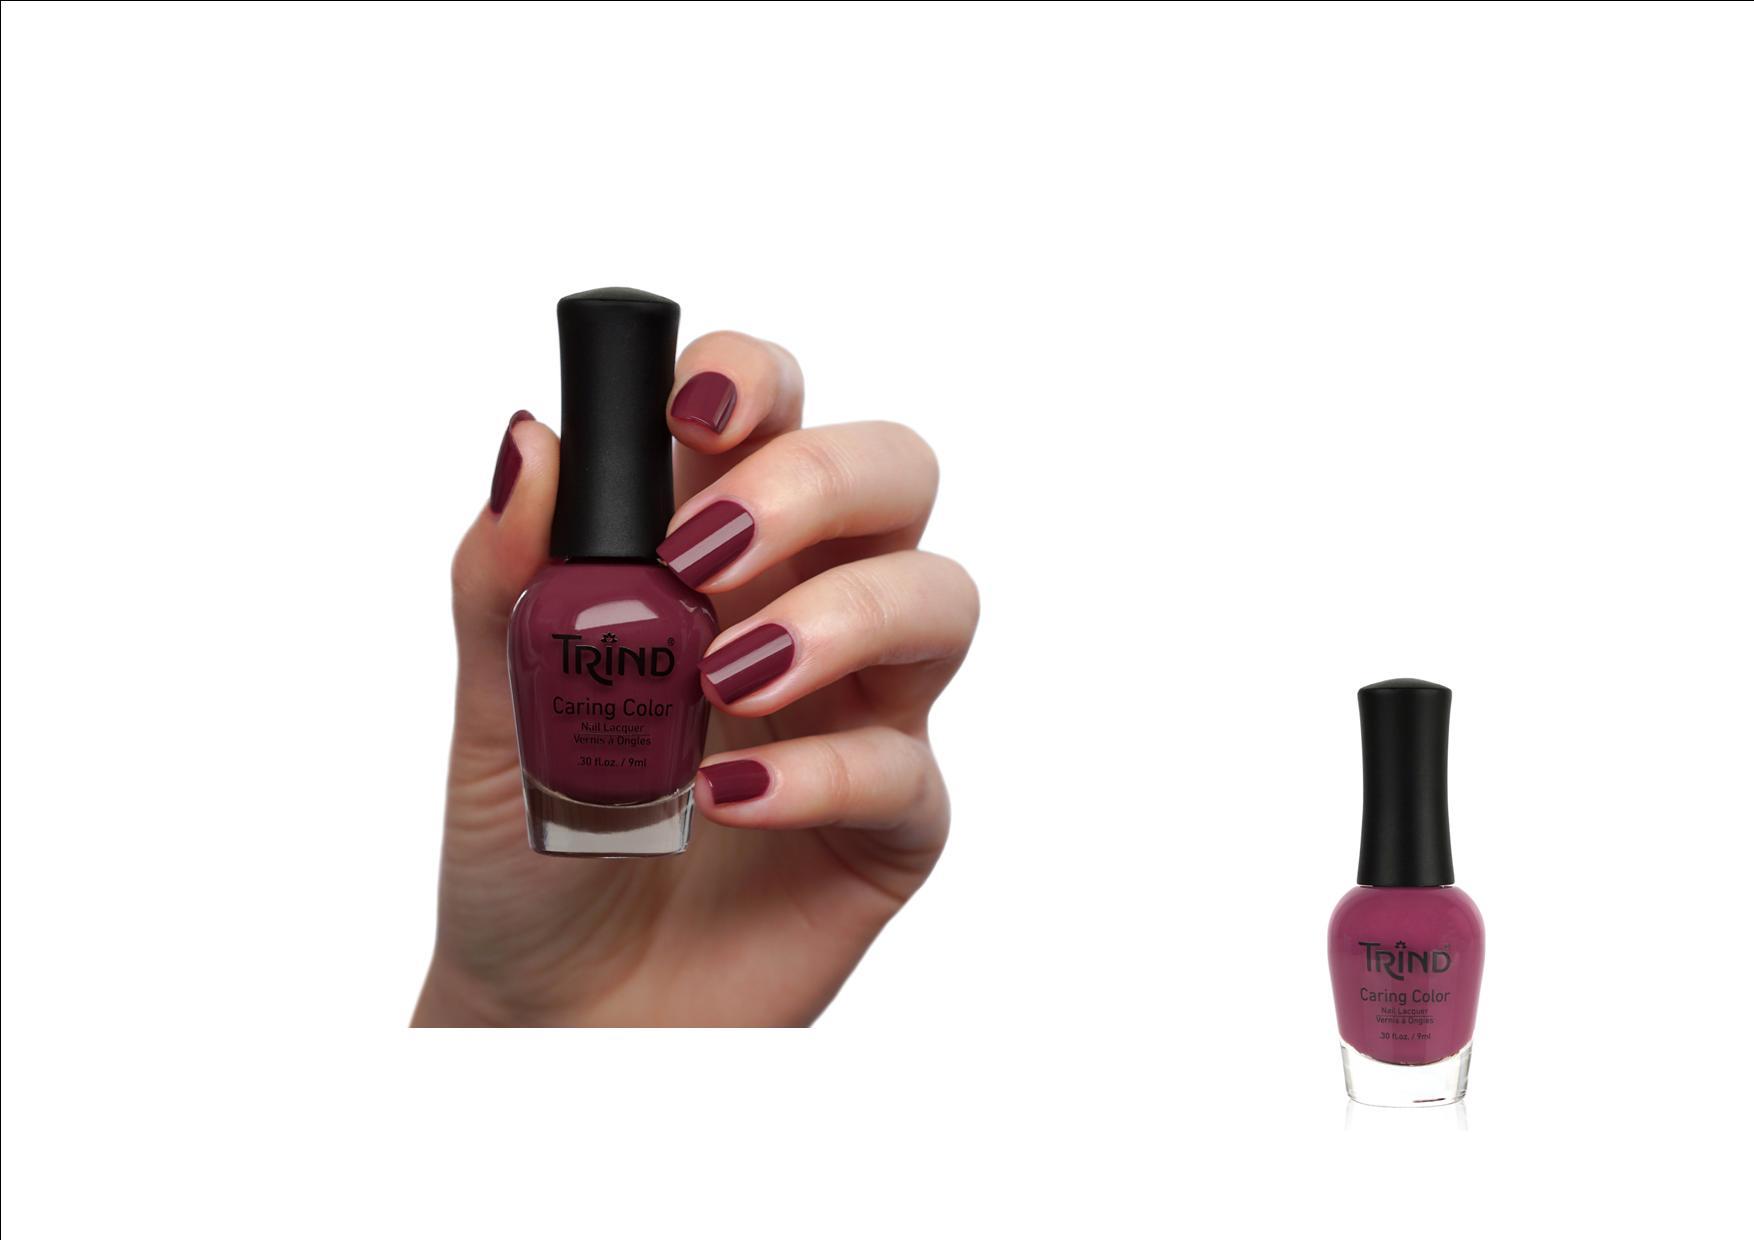 Trind Caring Color Nagellak 163 Raspberry  Swirl